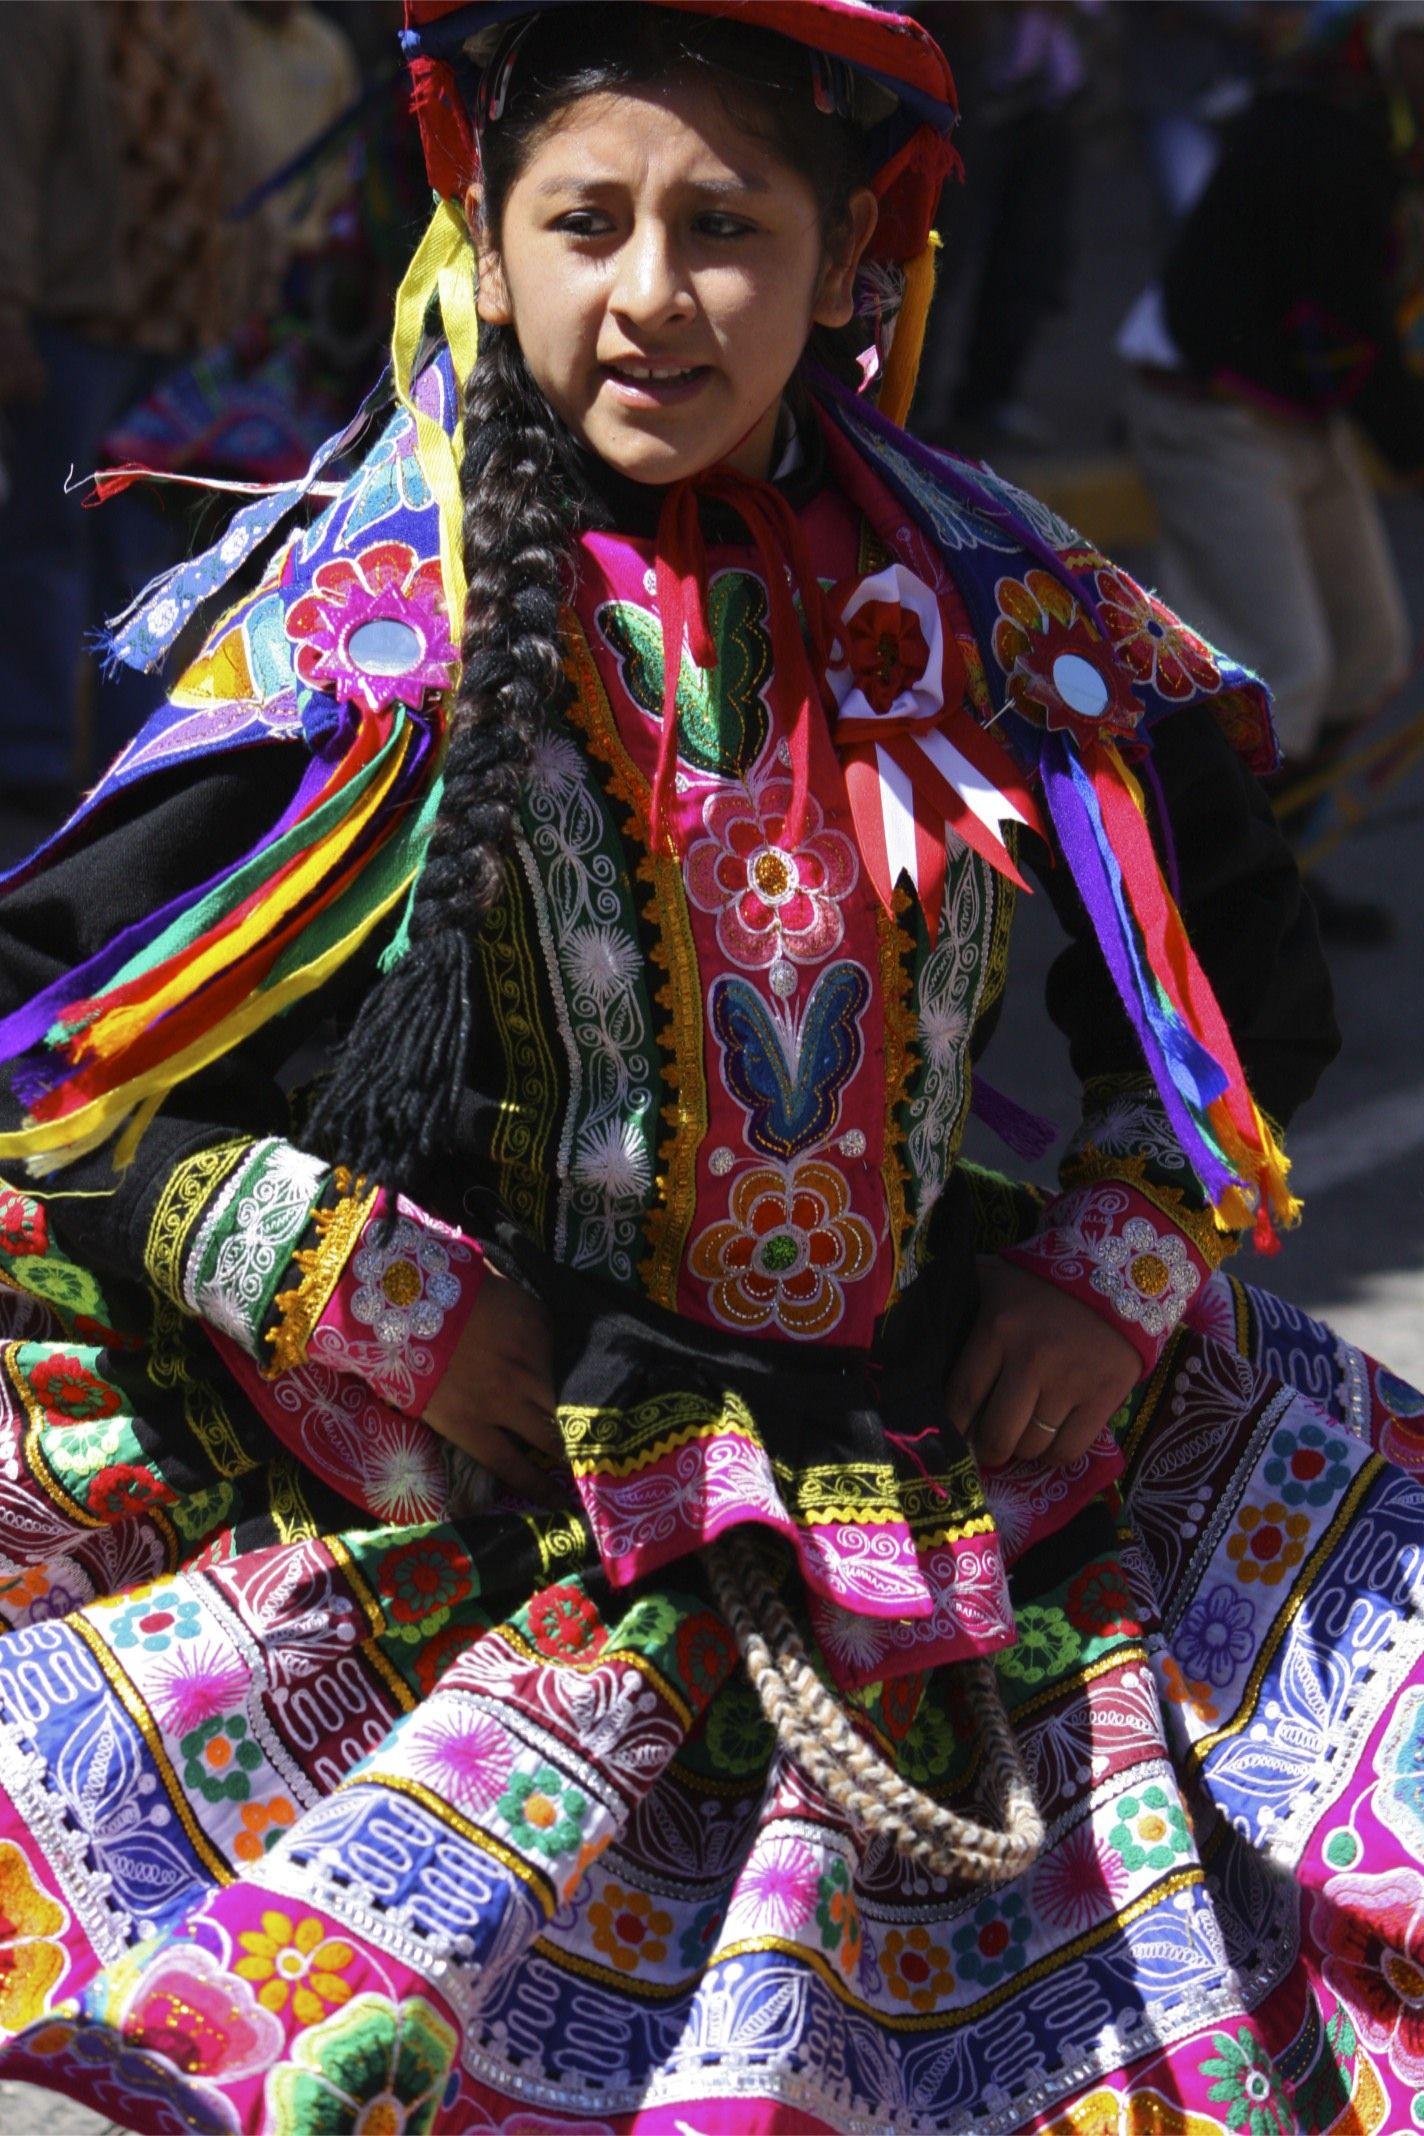 Traditional Peruvian Dress   Peruvian clothing, Traditional peruvian dress, Folk  dresses